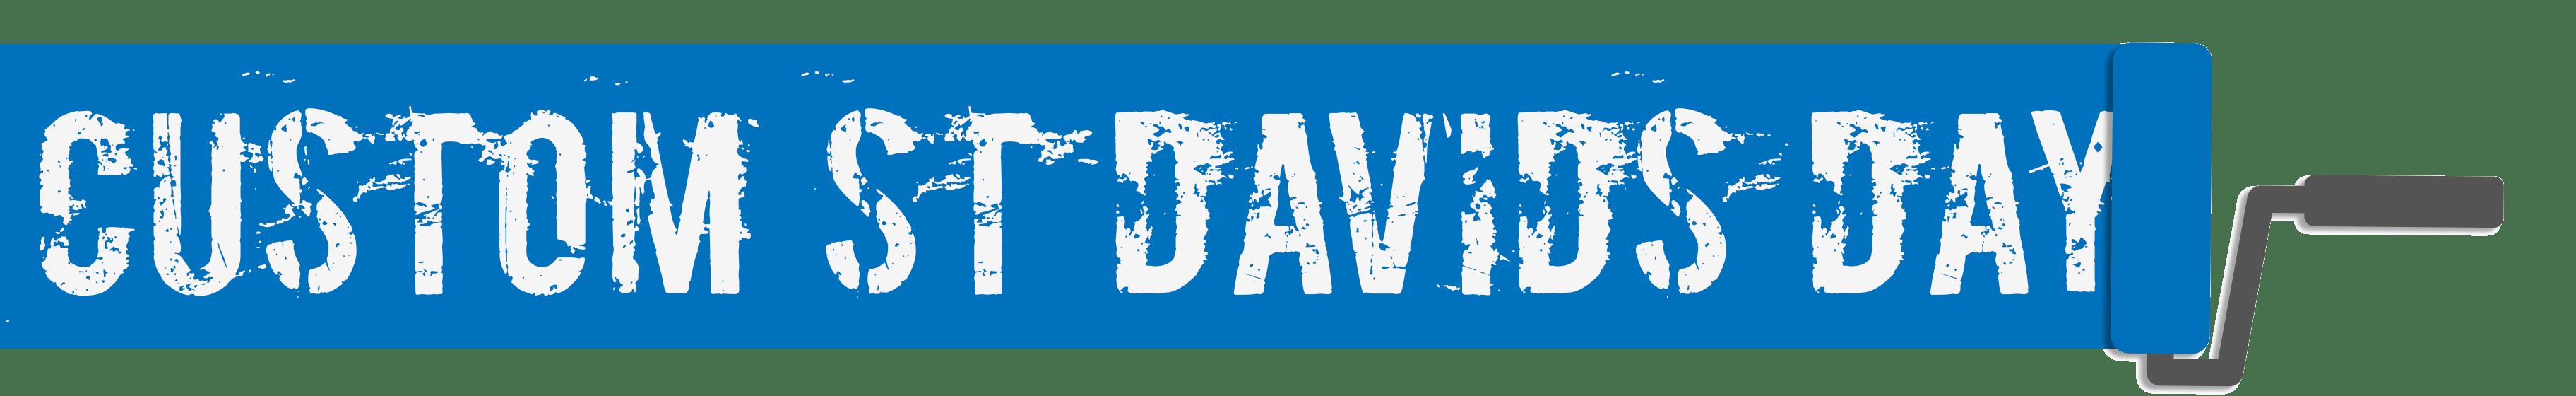 St David's Day